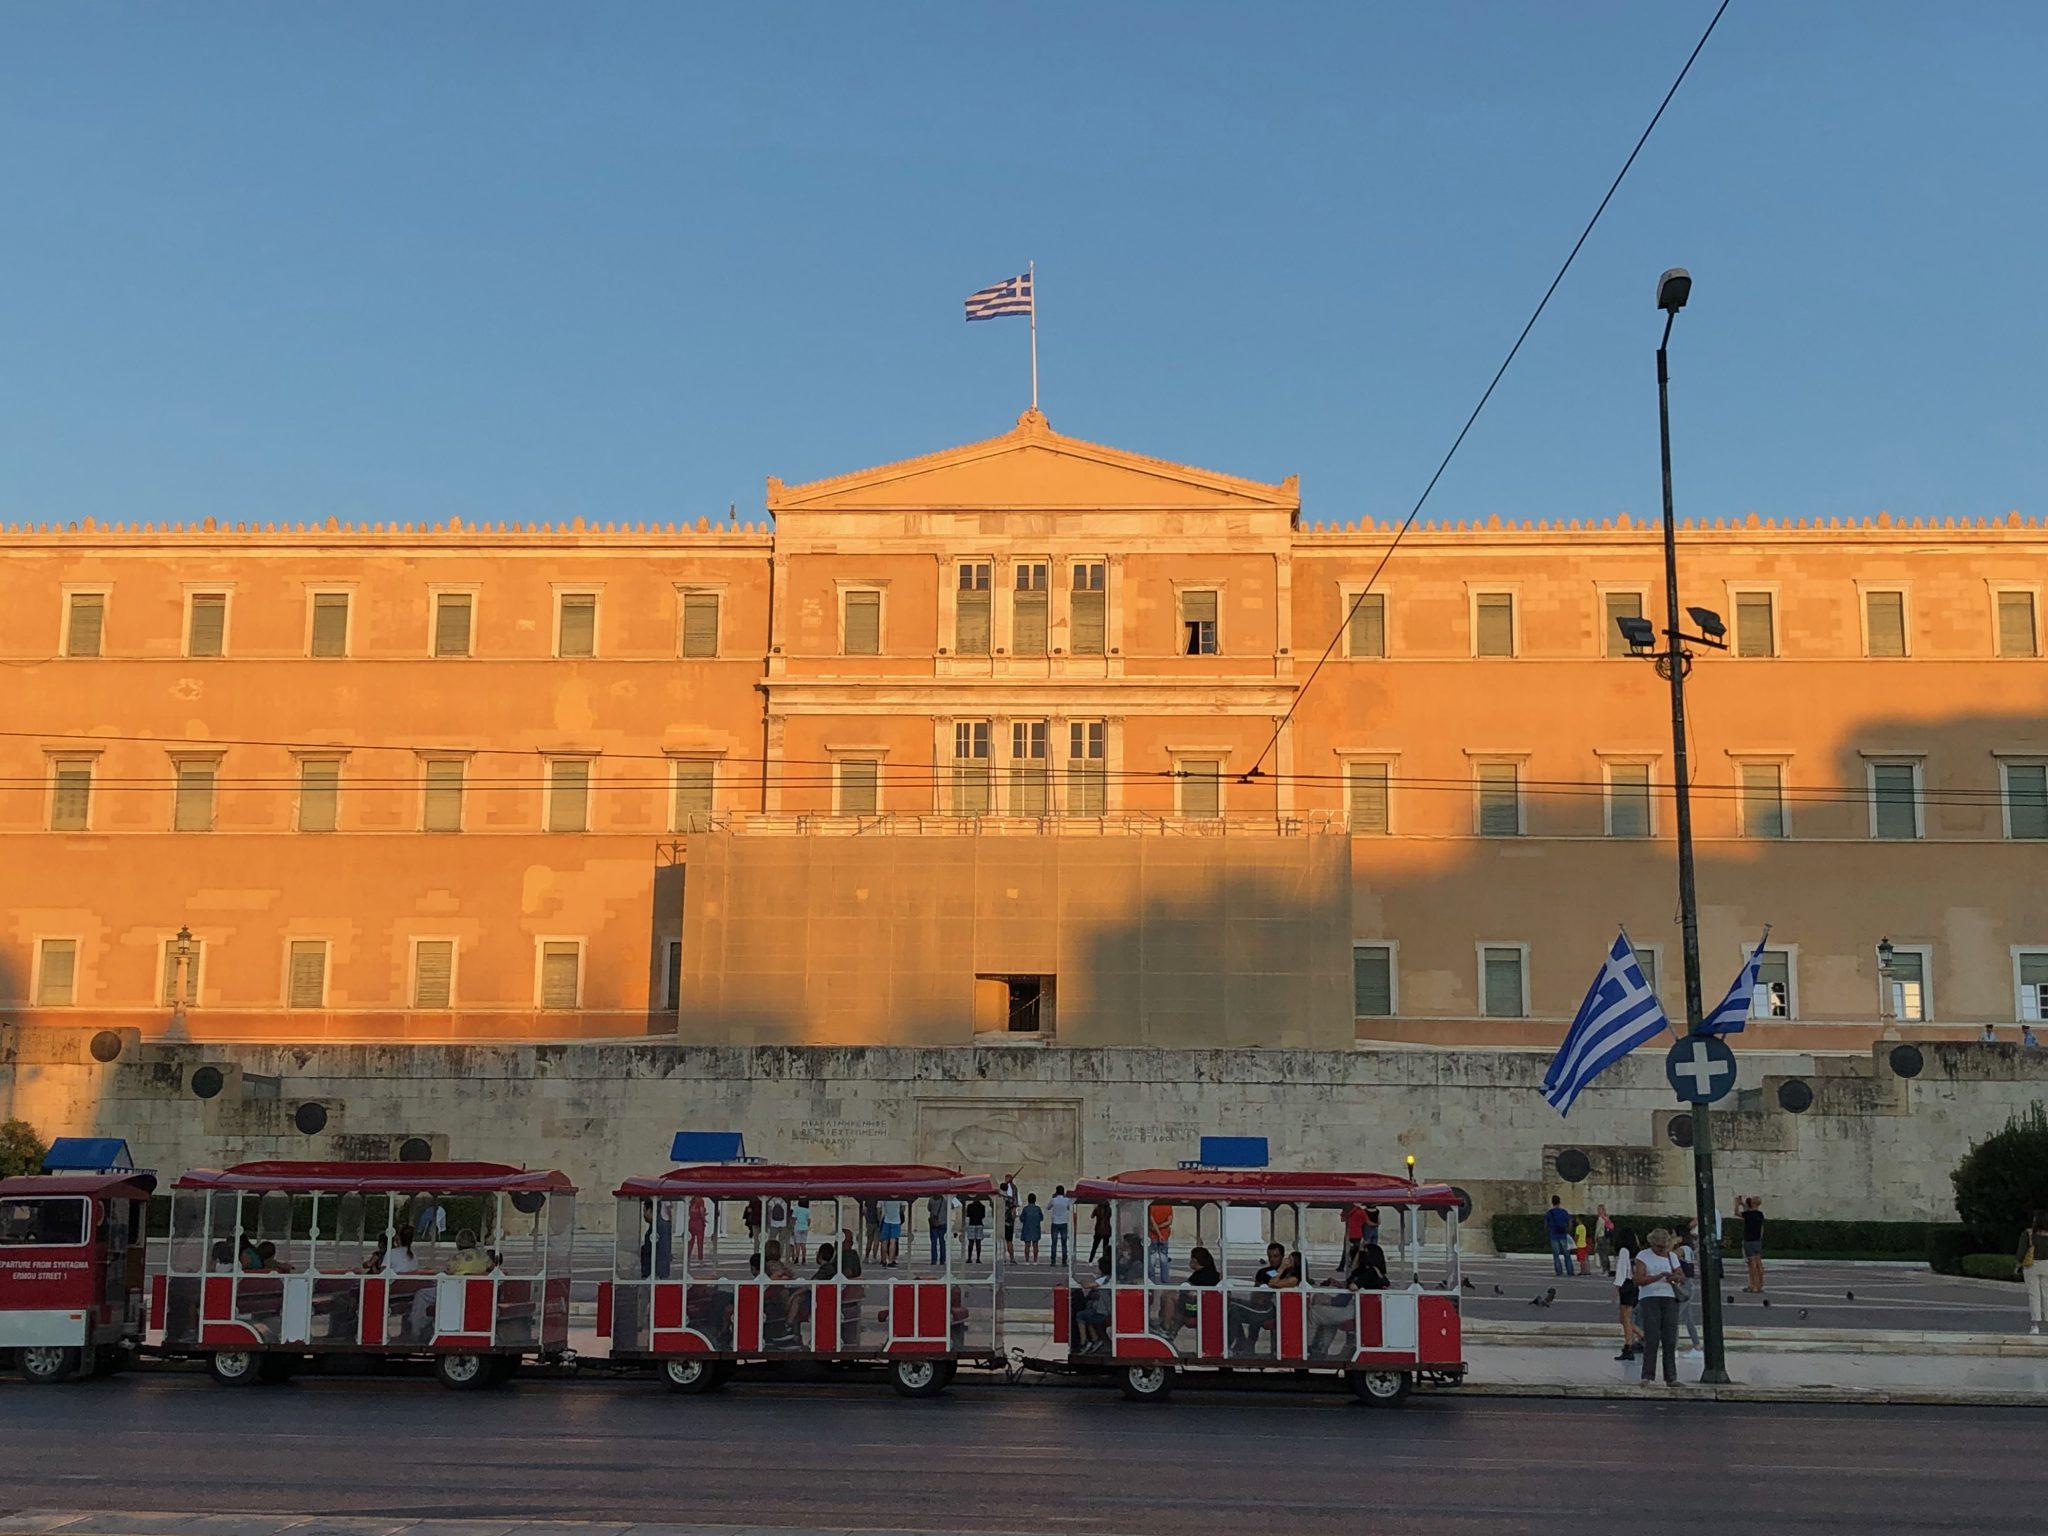 Getting around Athens